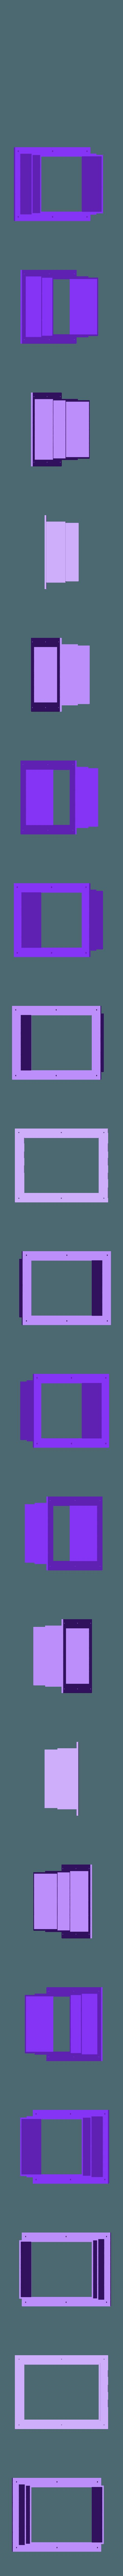 KatzenklappeTeil1.stl Download free STL file Cat Flap Automatic Door • 3D printing model, Edd77